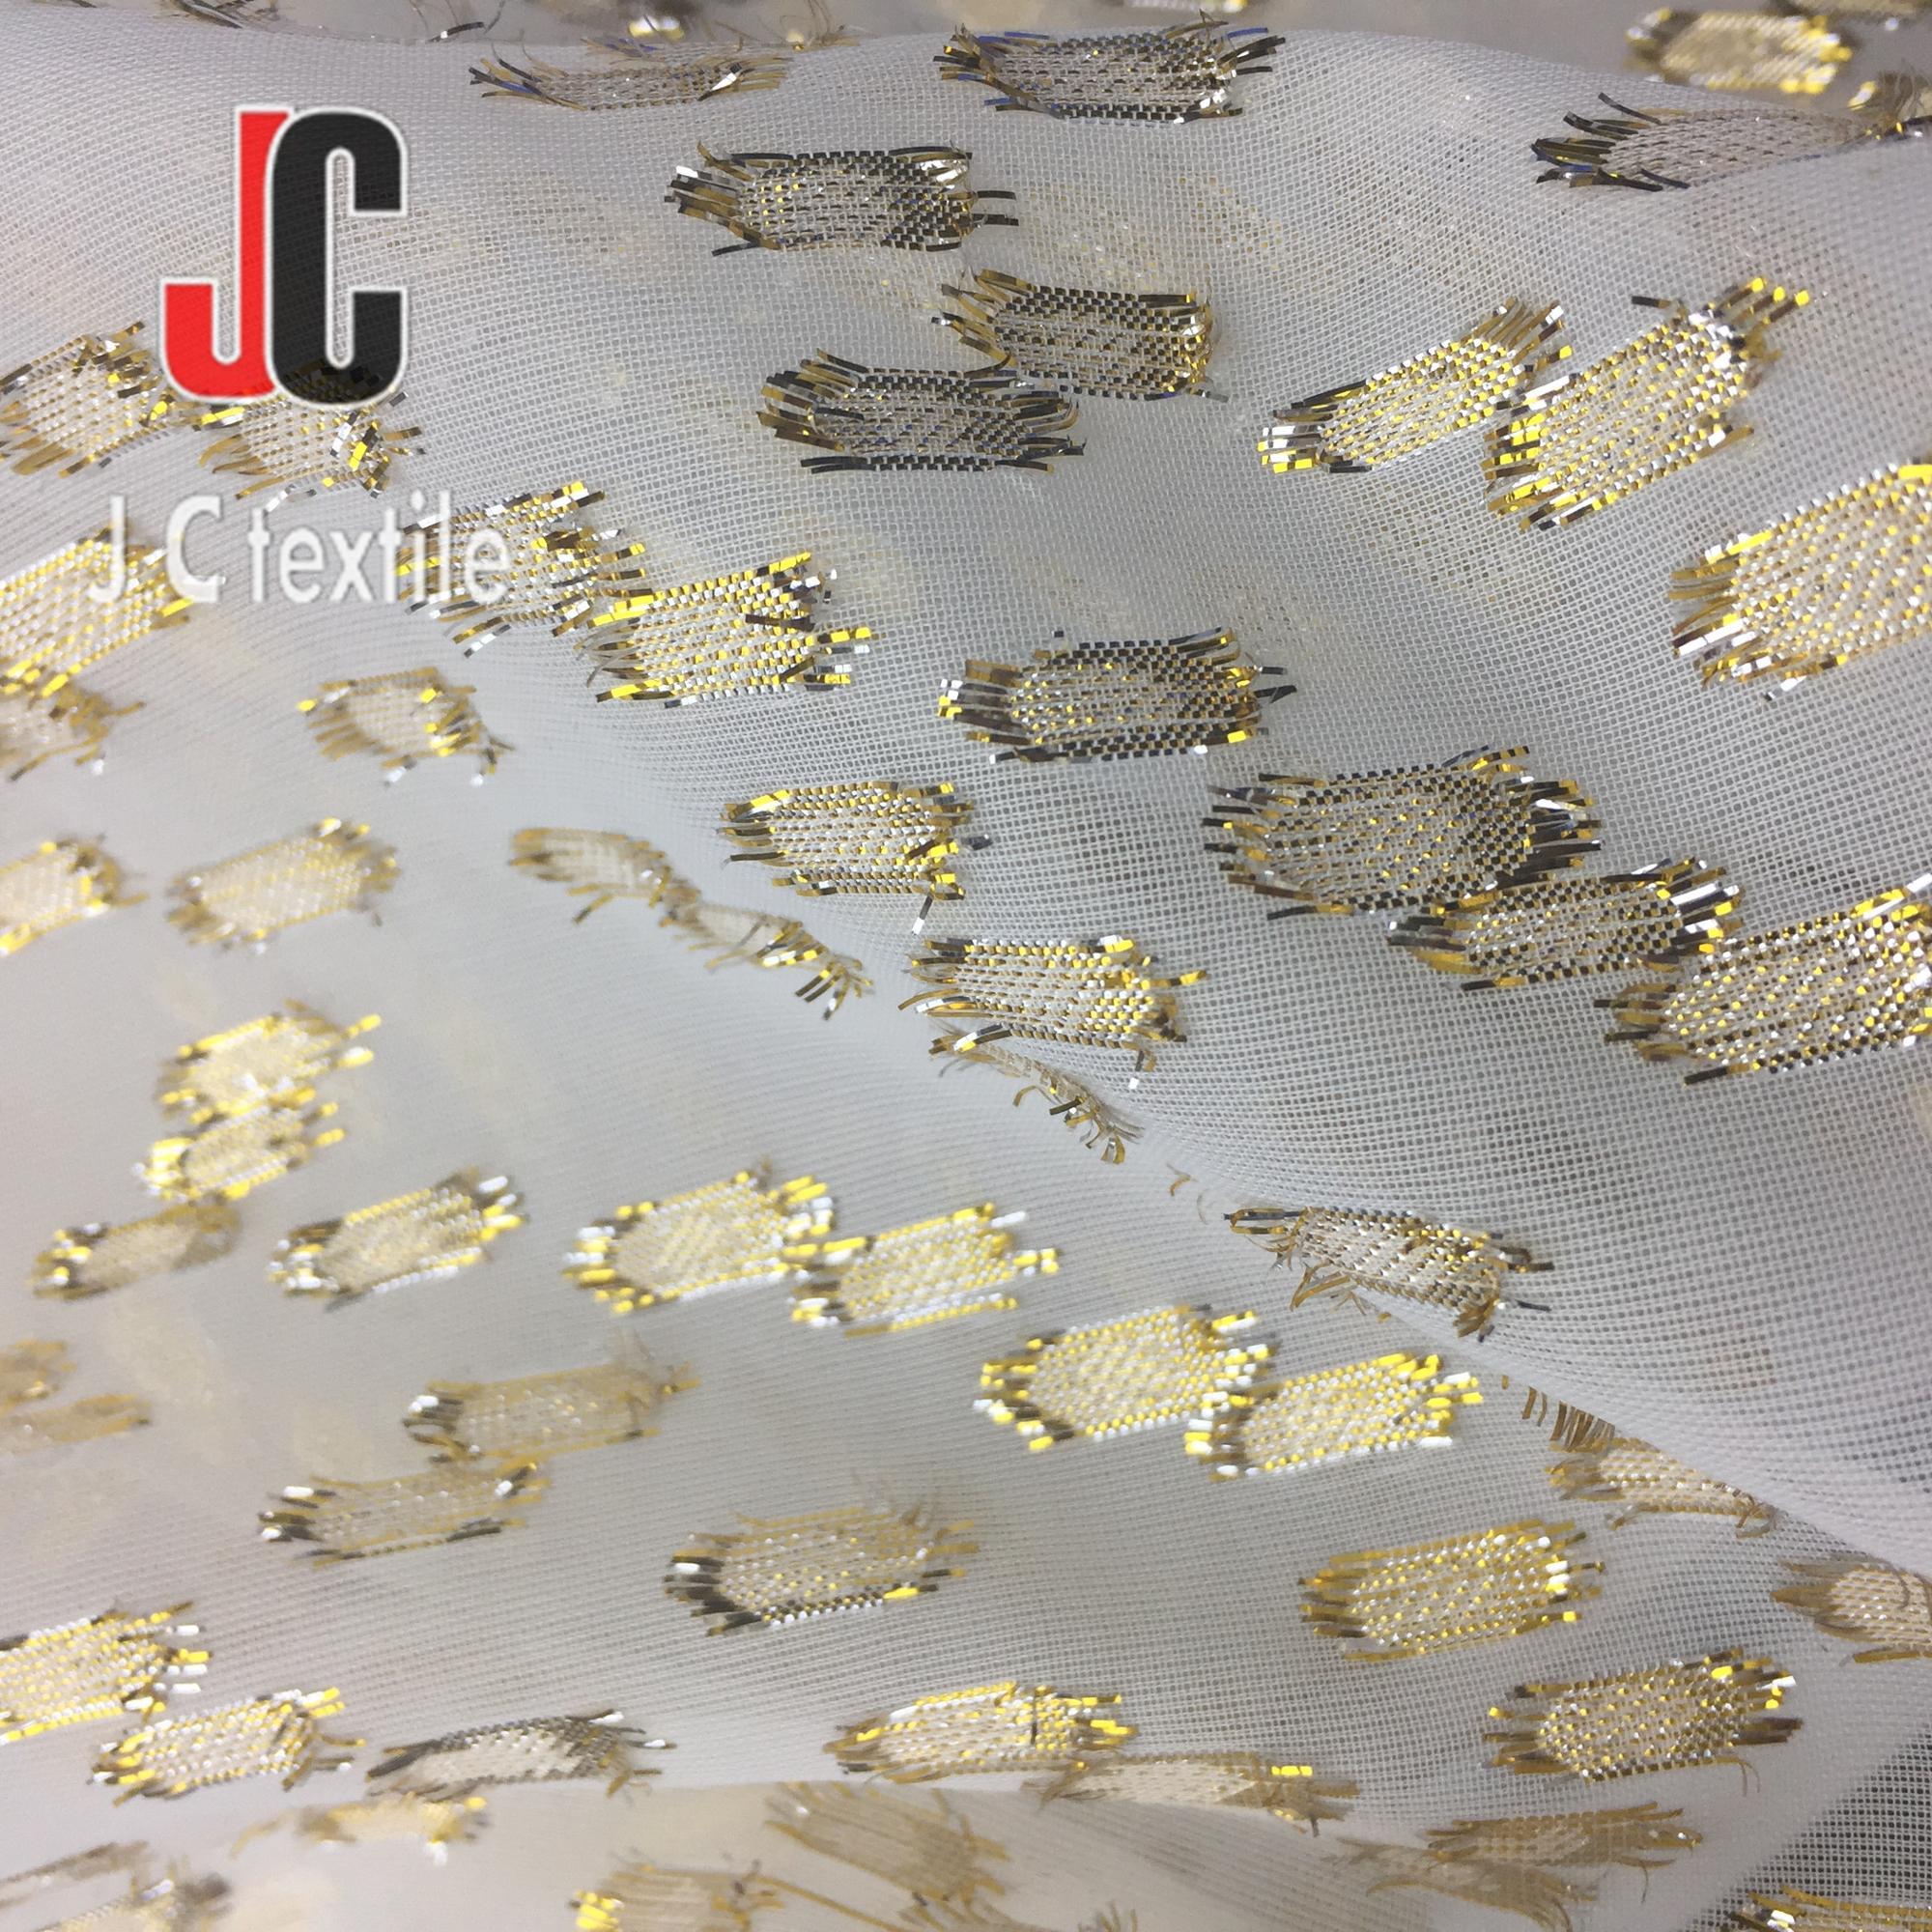 JC-M13663 fashion plain dyed lurex jacquard pure chiffon georgette fabric for dress